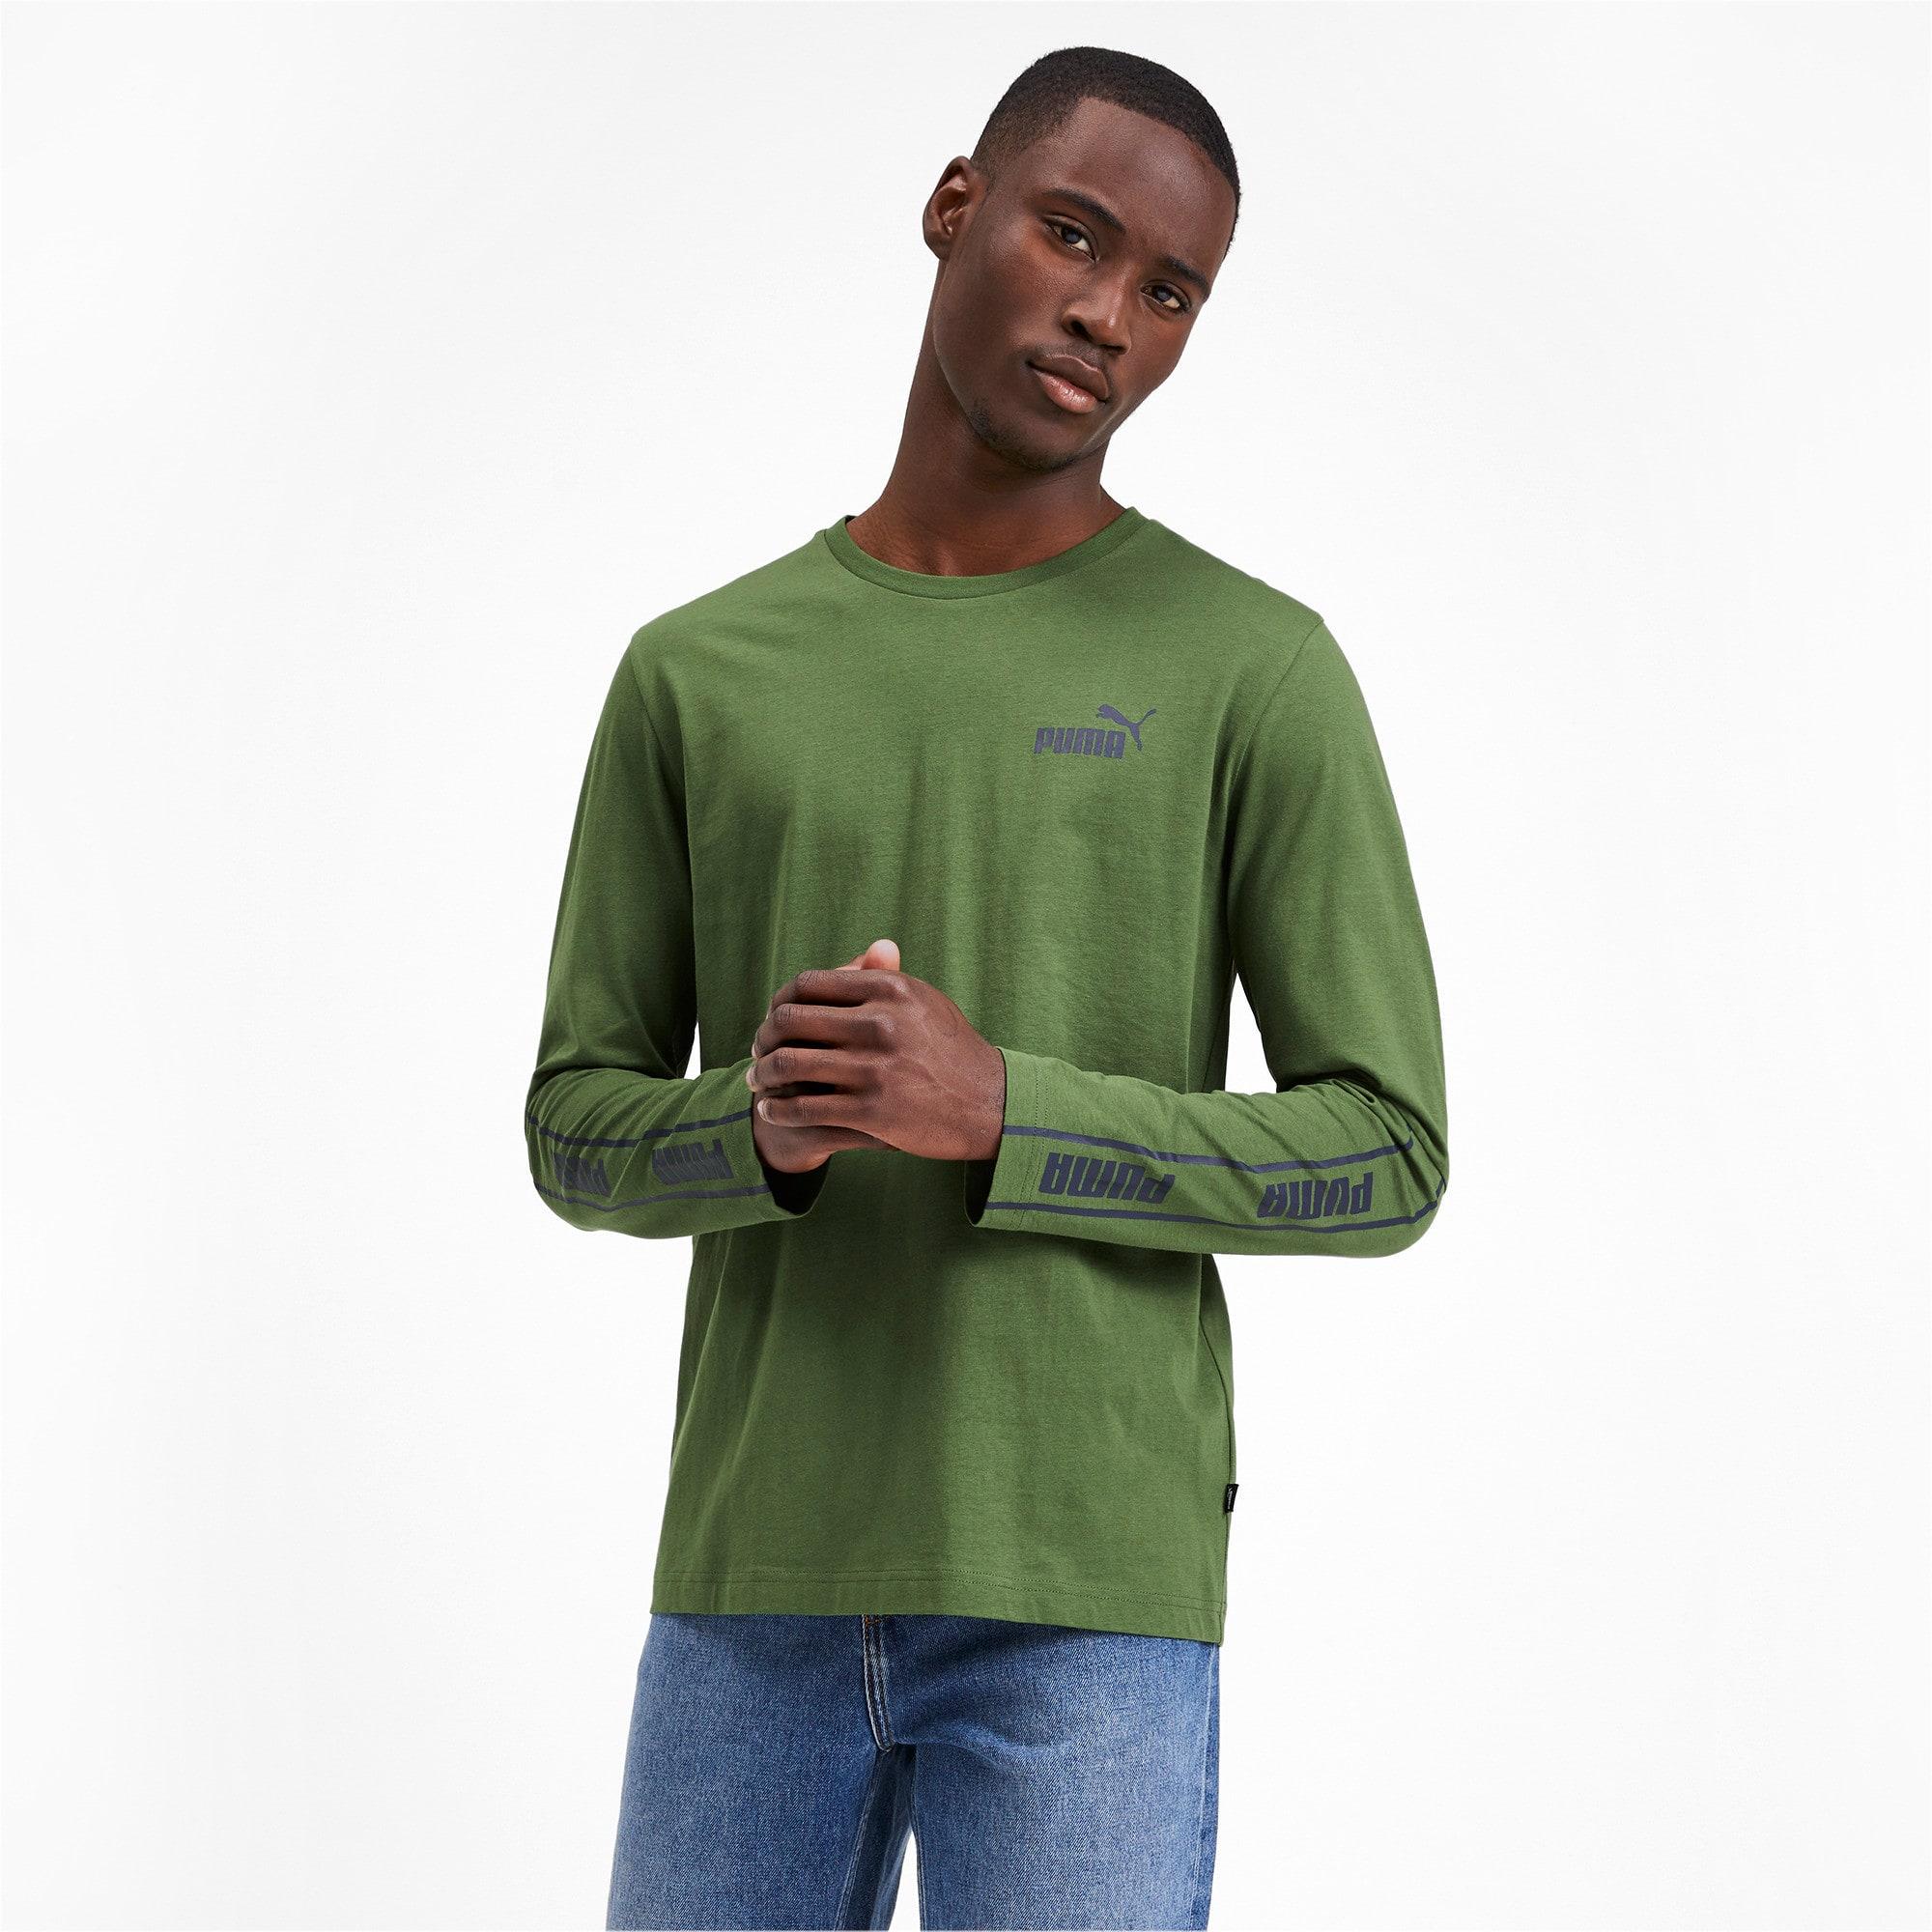 Thumbnail 1 of Amplified Long Sleeve Men's Tee, Garden Green, medium-IND